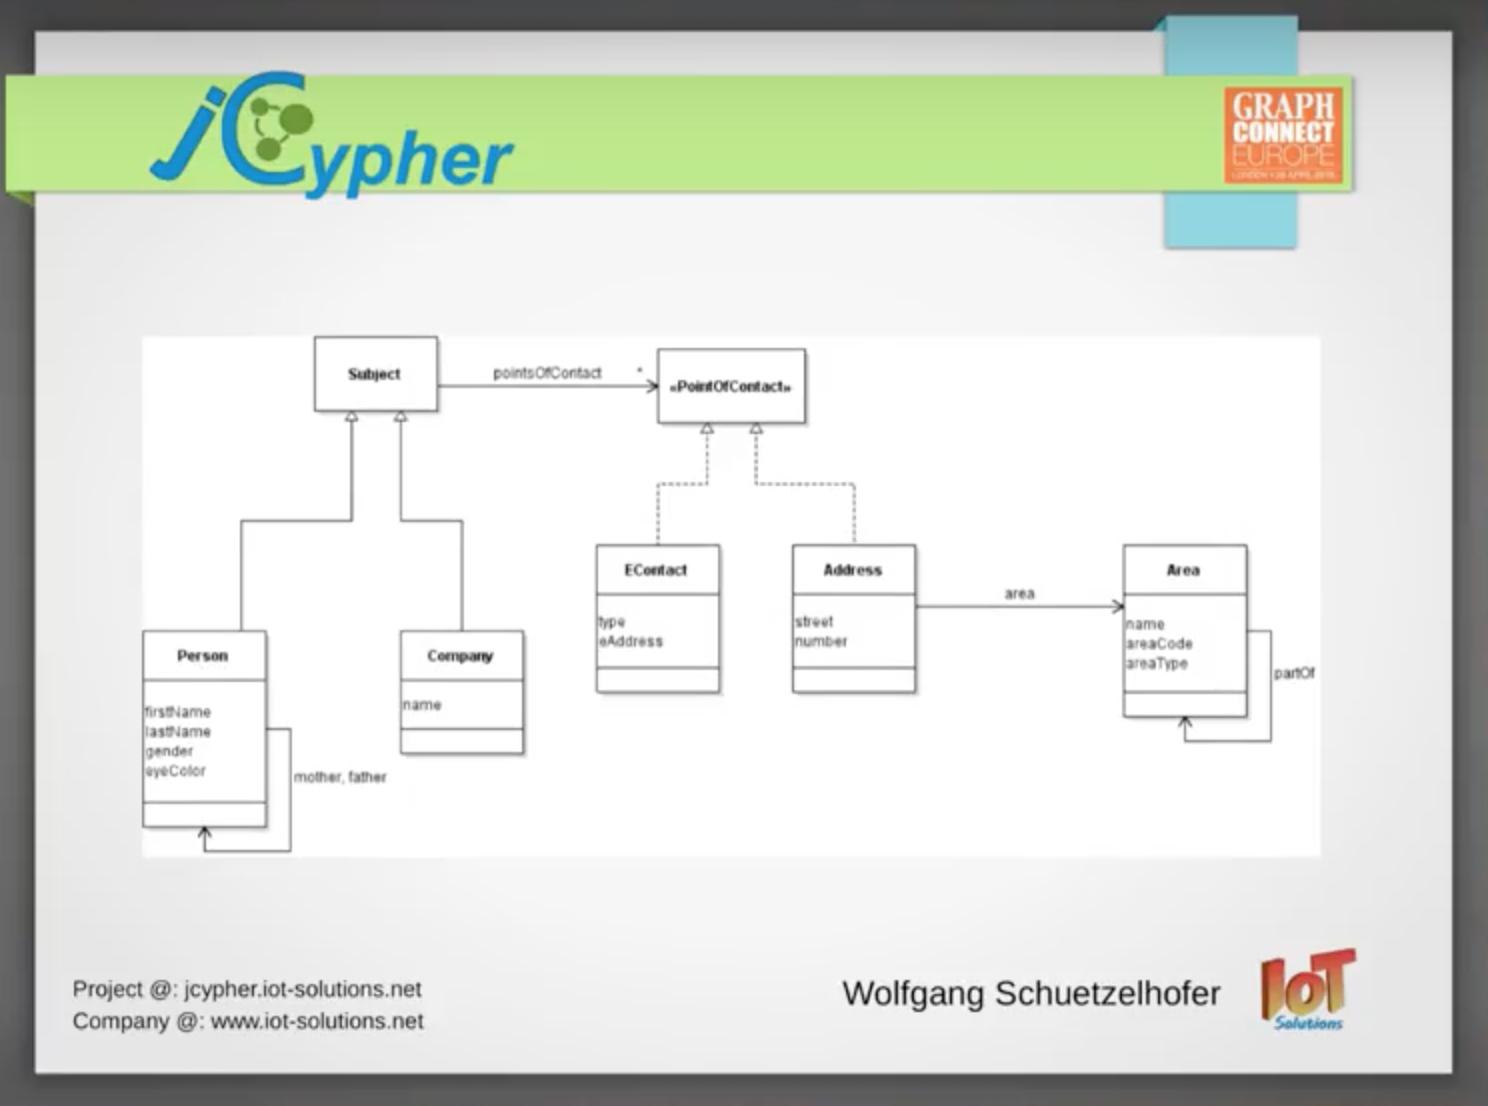 JCypher Data Model